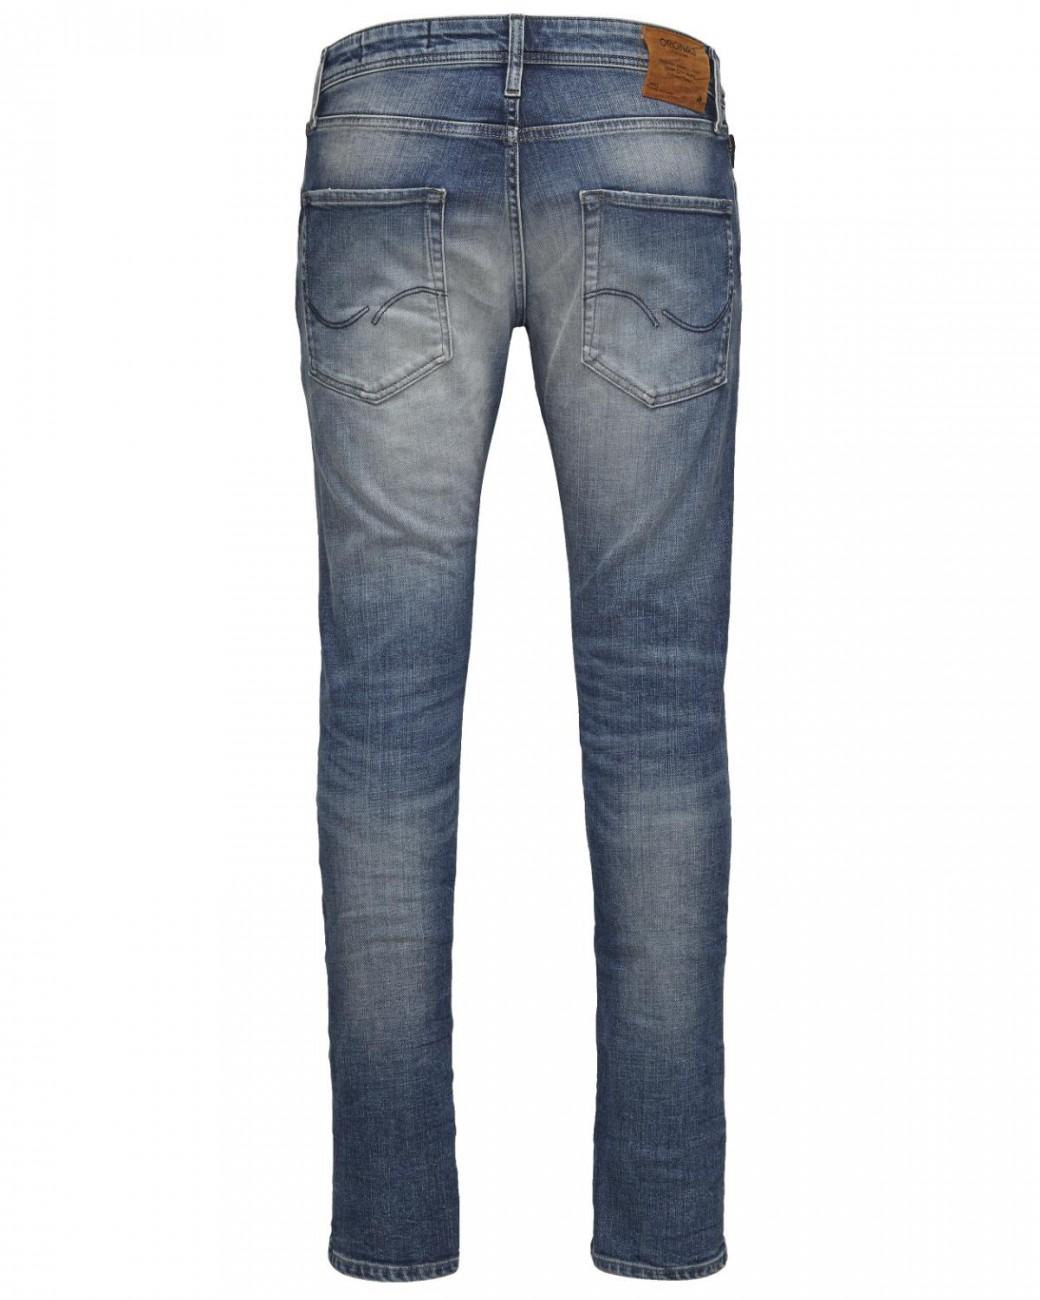 Jack & Jones Herren Jeans JJGLENN - Slim Fit